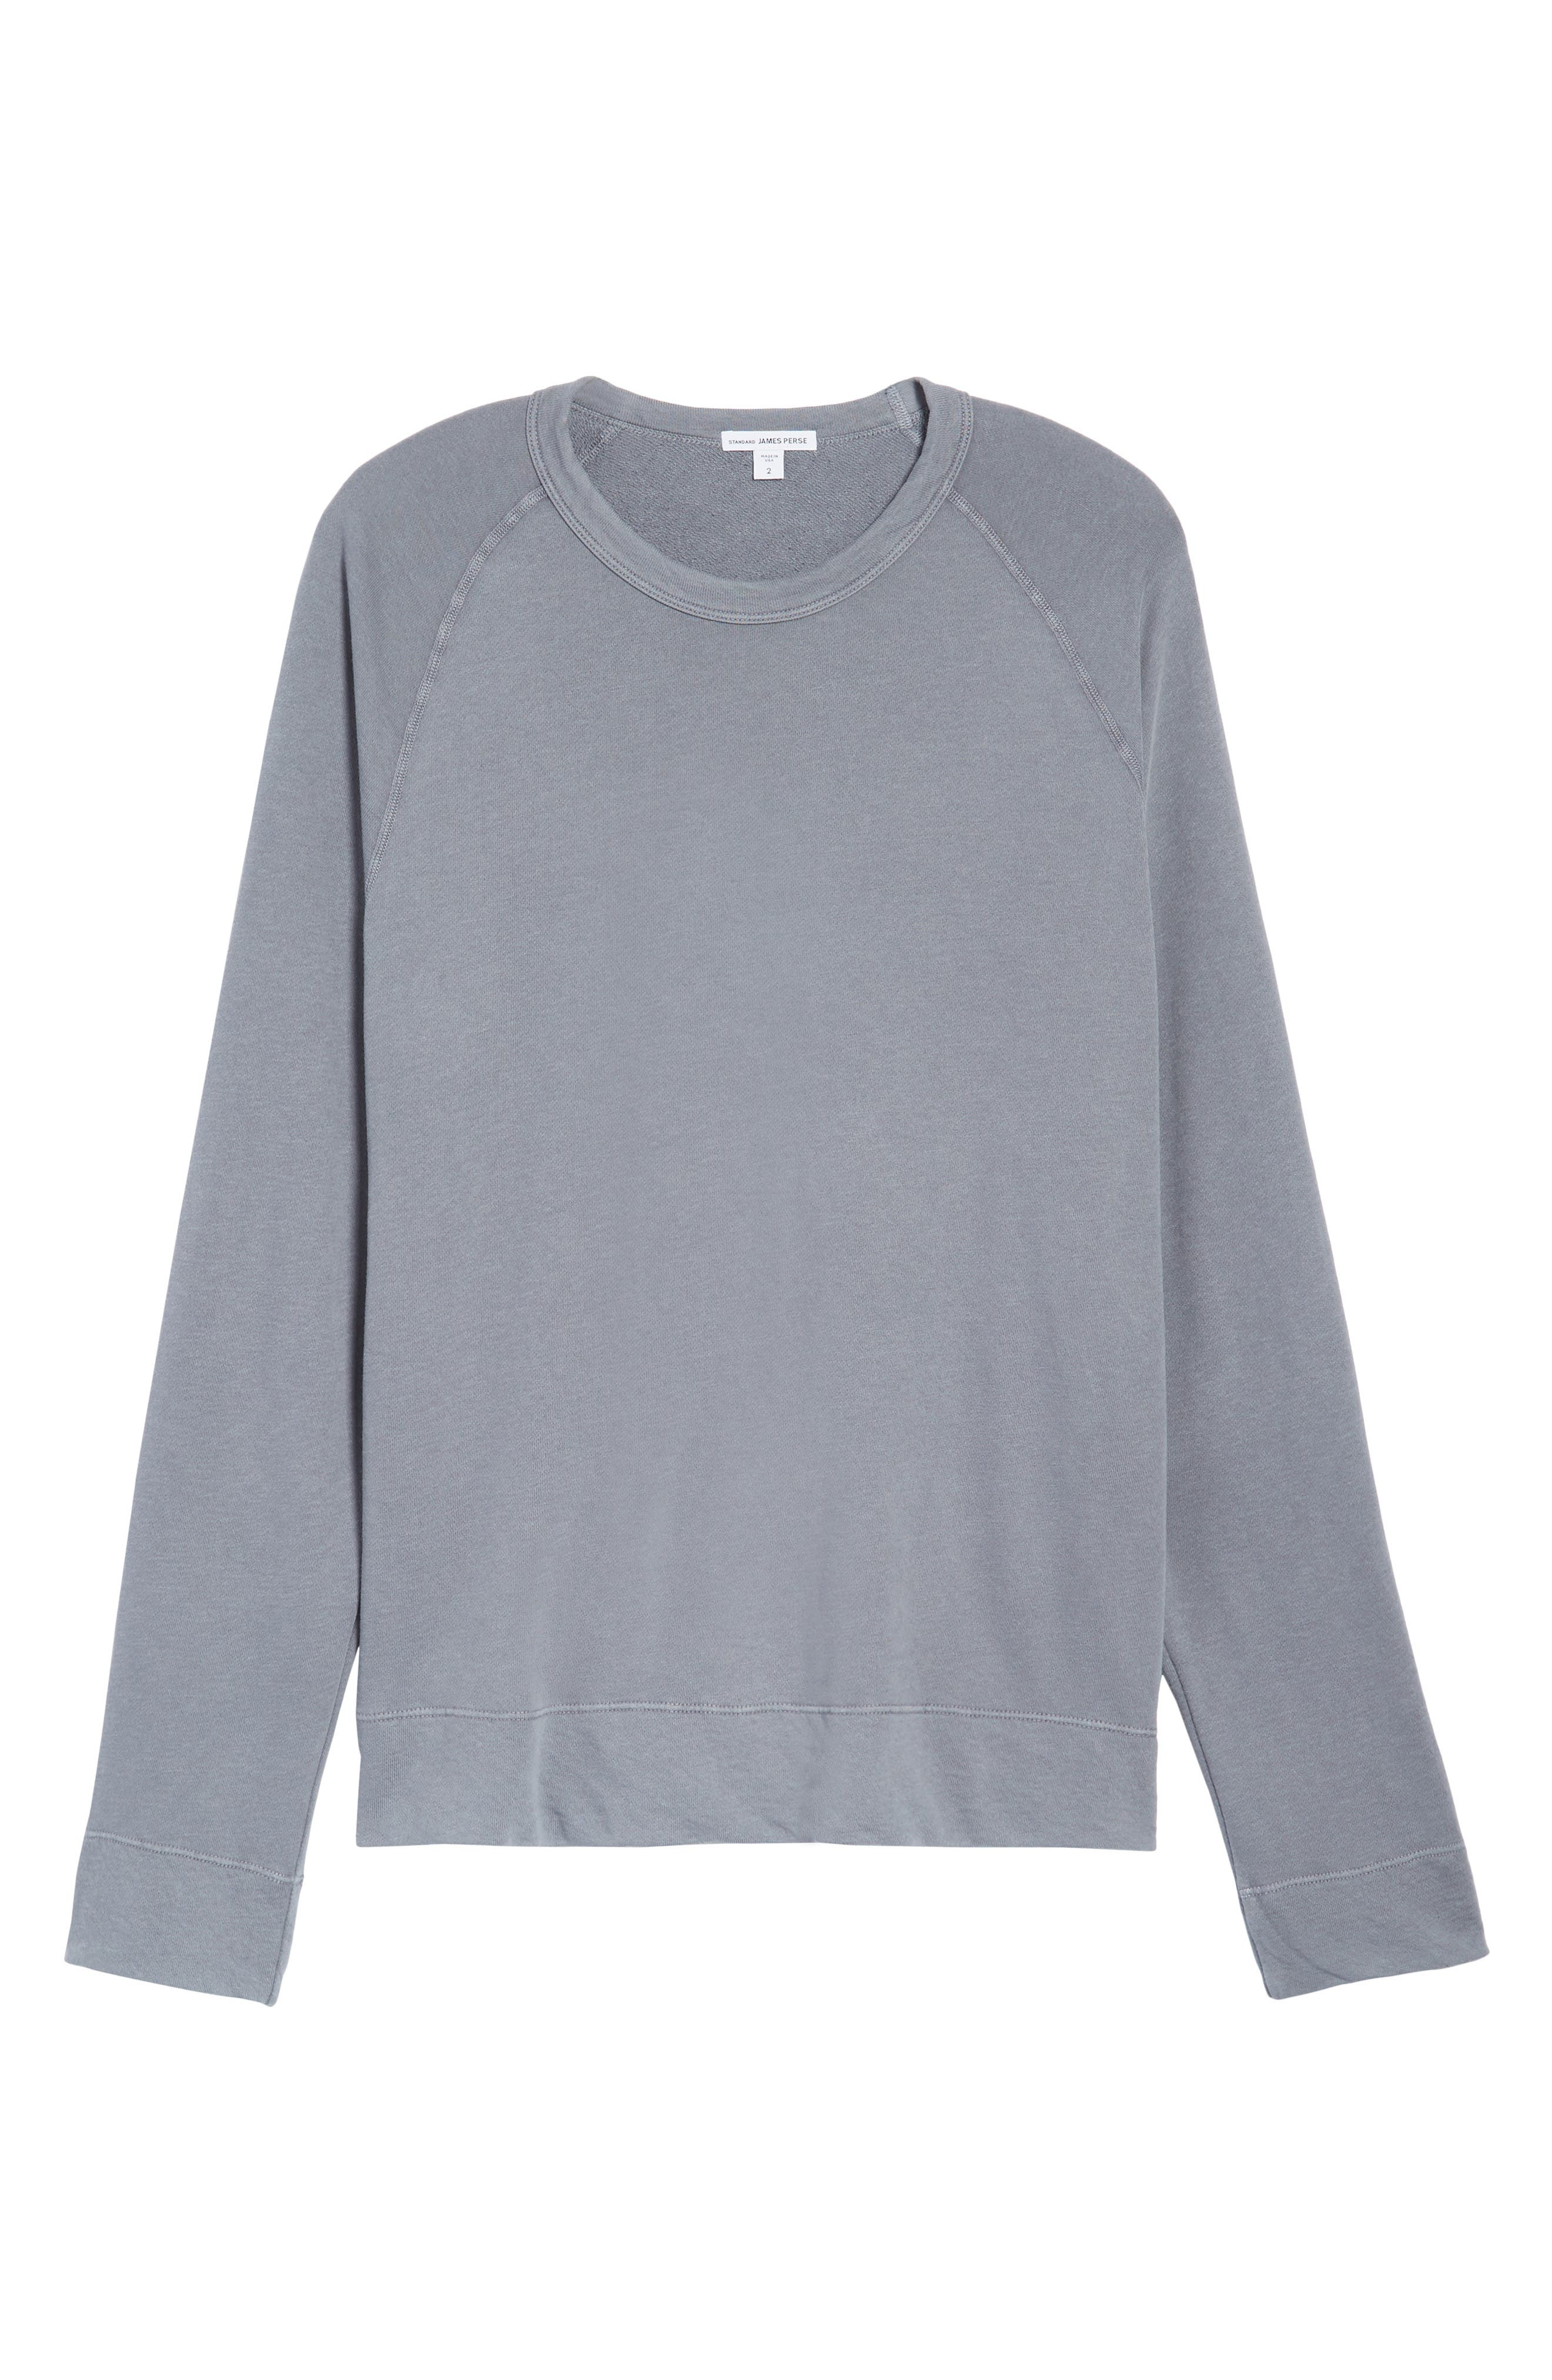 Raglan Crewneck Sweatshirt,                             Alternate thumbnail 6, color,                             029